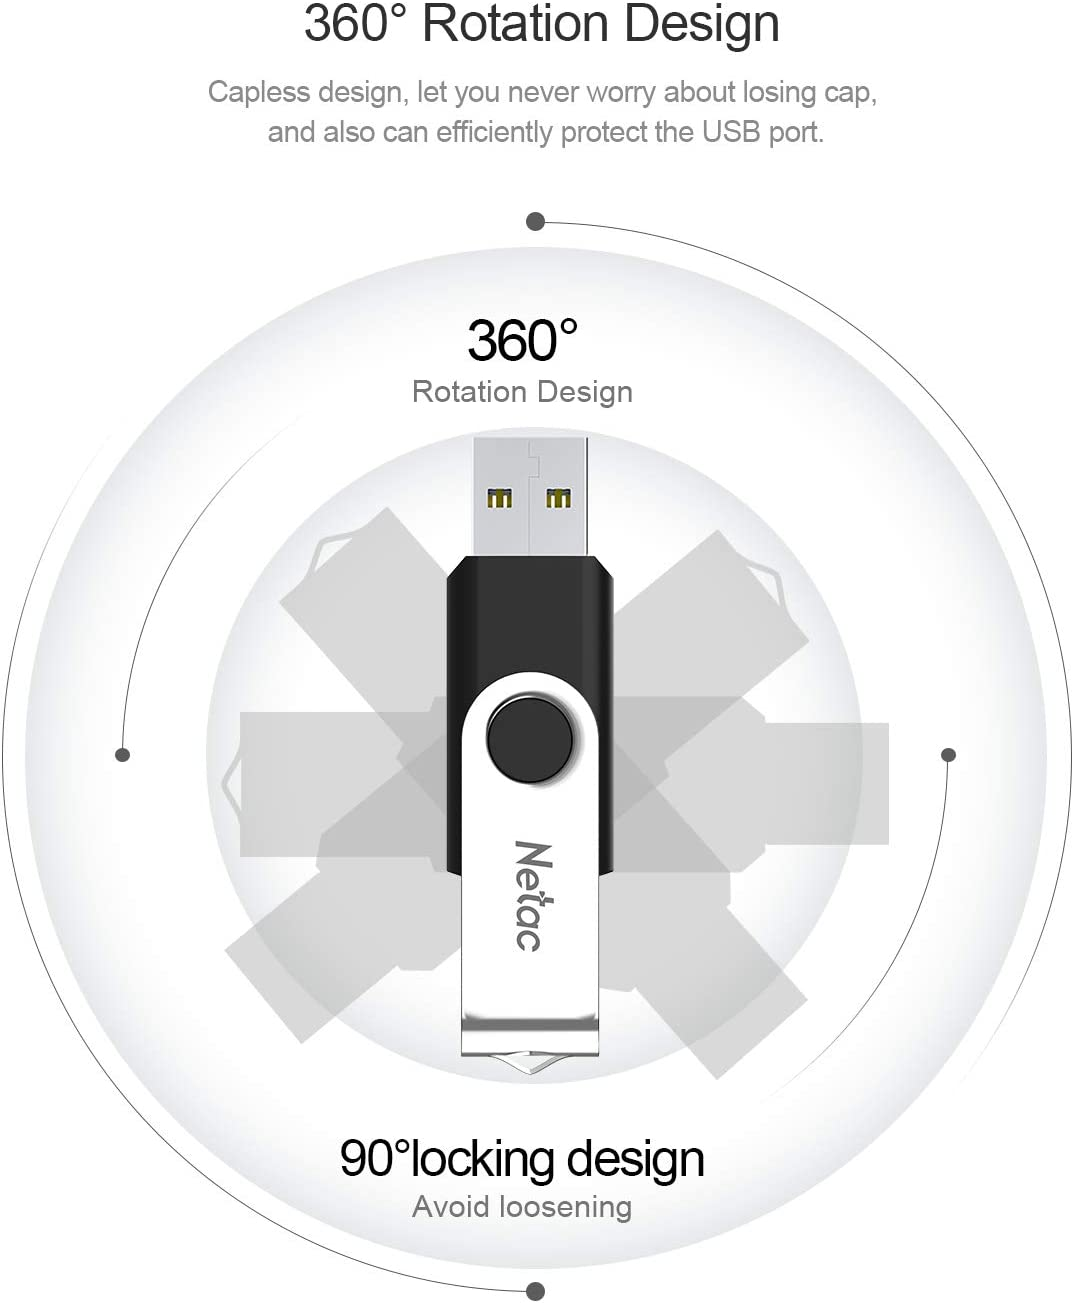 U505 USB Flash Drive 16GB 10Packs USB Stick USB Memory Stick for Computer//Laptop//External Data Storage USB 2.0 Thumb Drive Bulk Metal Swivel Design Jump Drive for Photo//Video Pen Drive